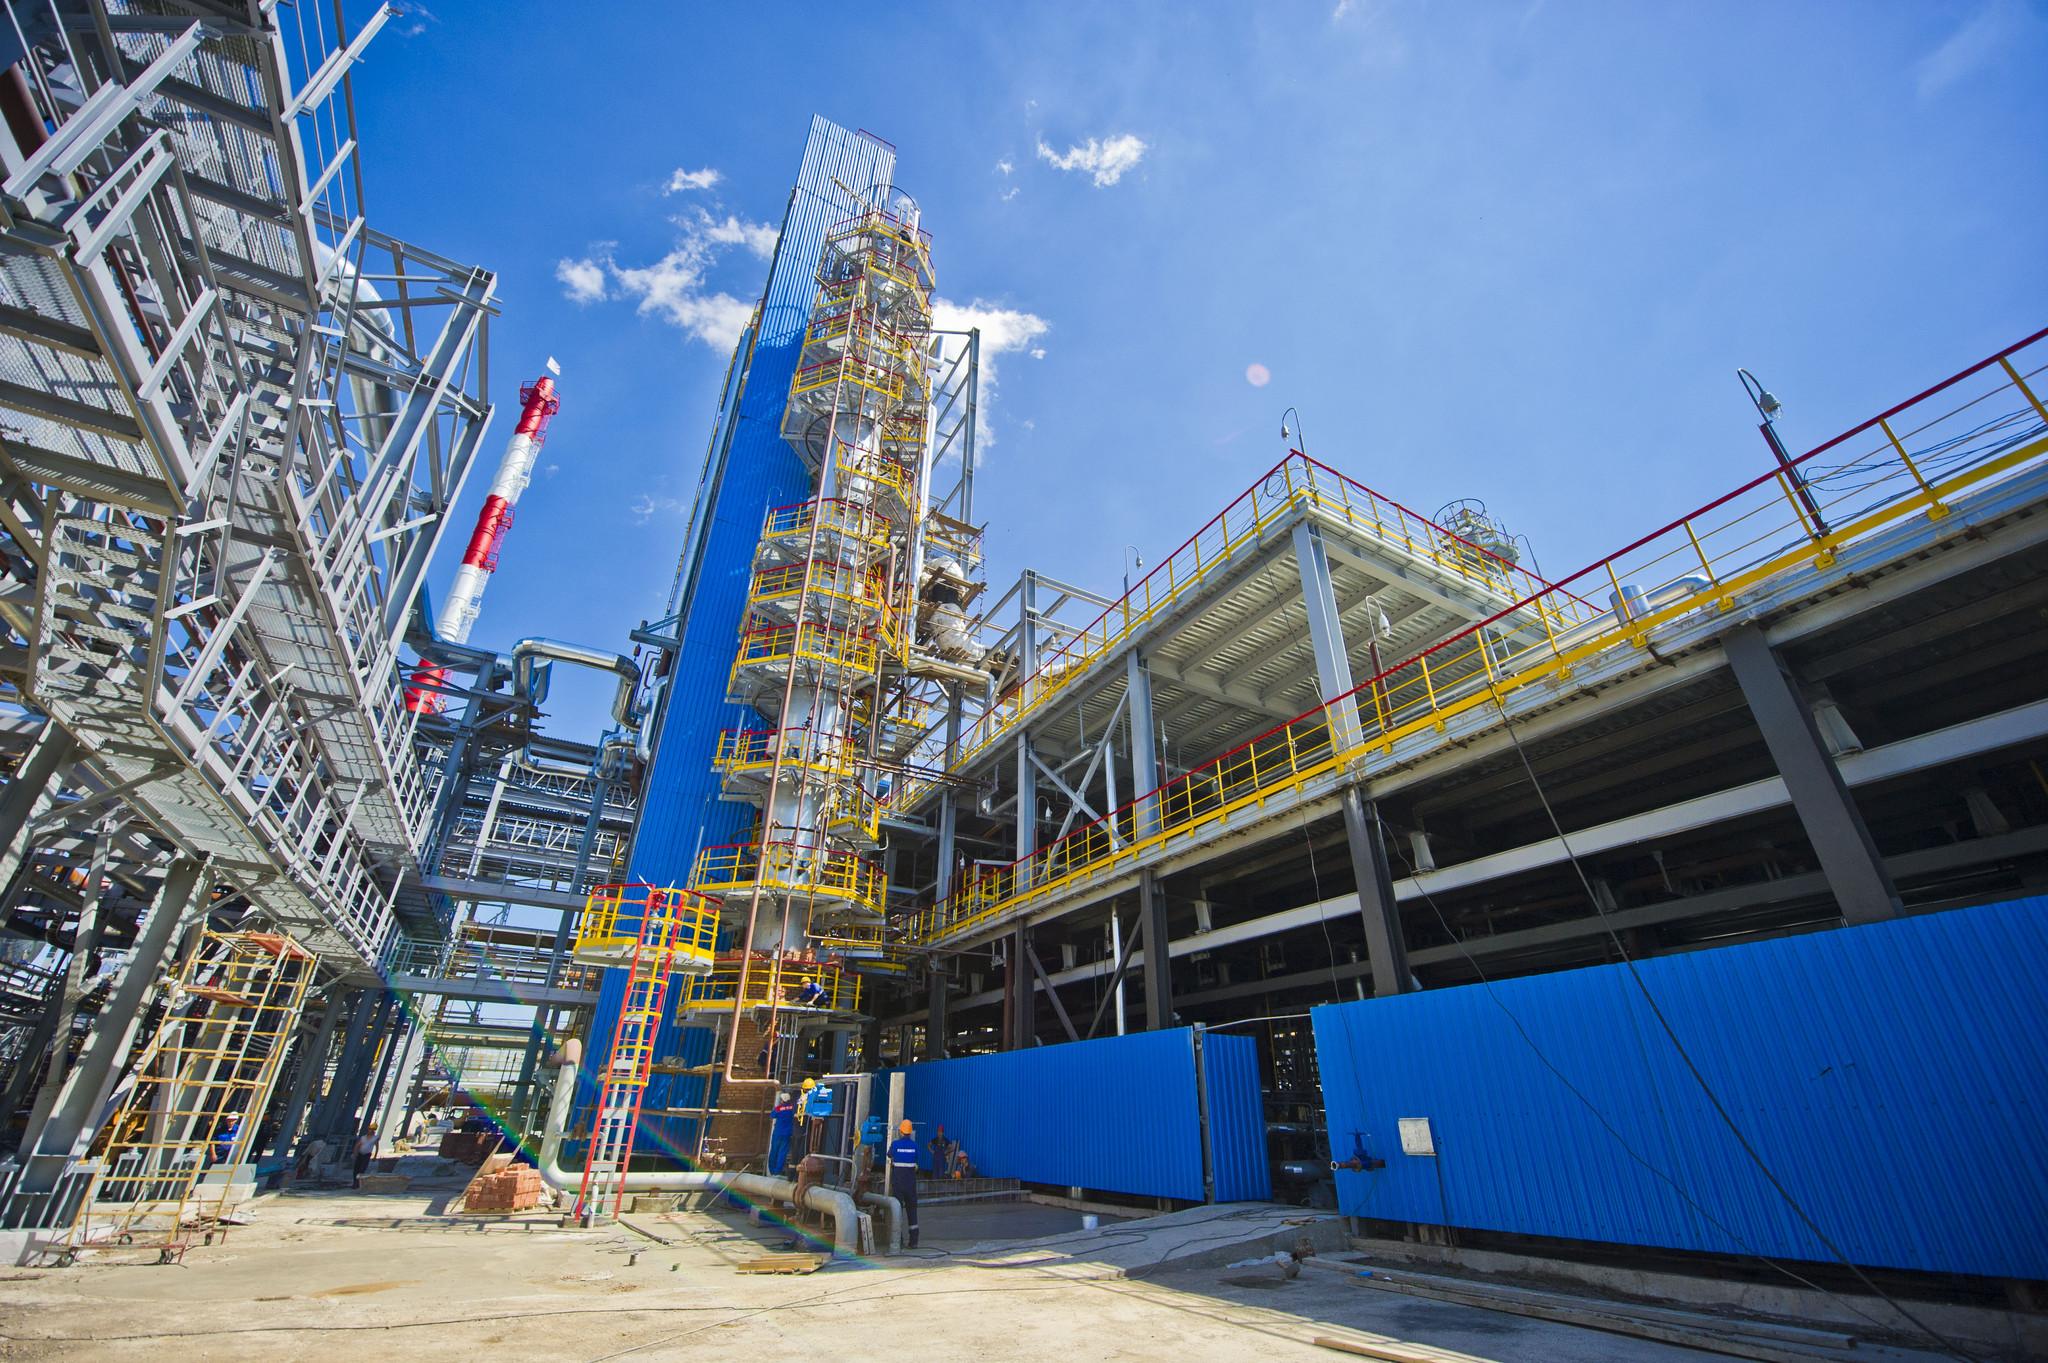 JSC Gazprom neftekhim Salavat 40